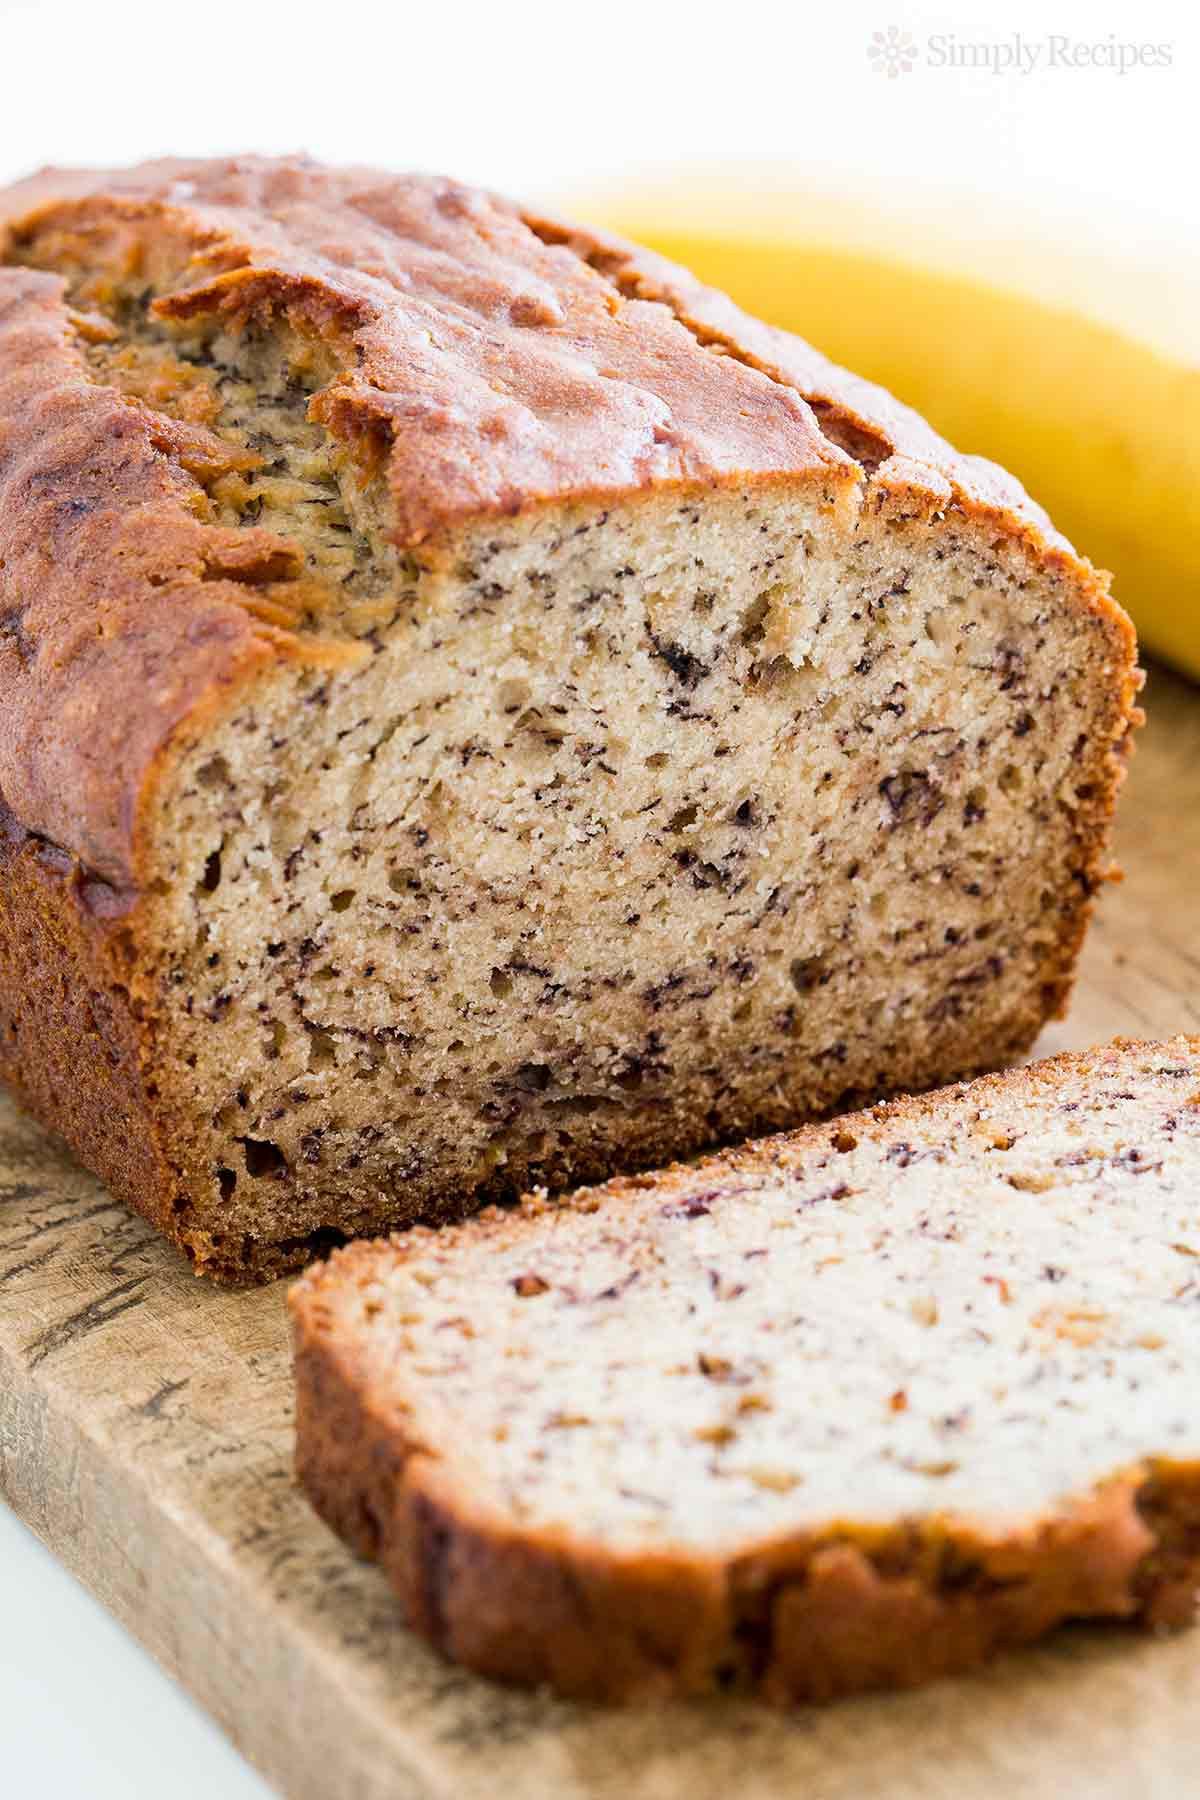 Banana Bread Ingredients  Banana Bread Recipe [with video]